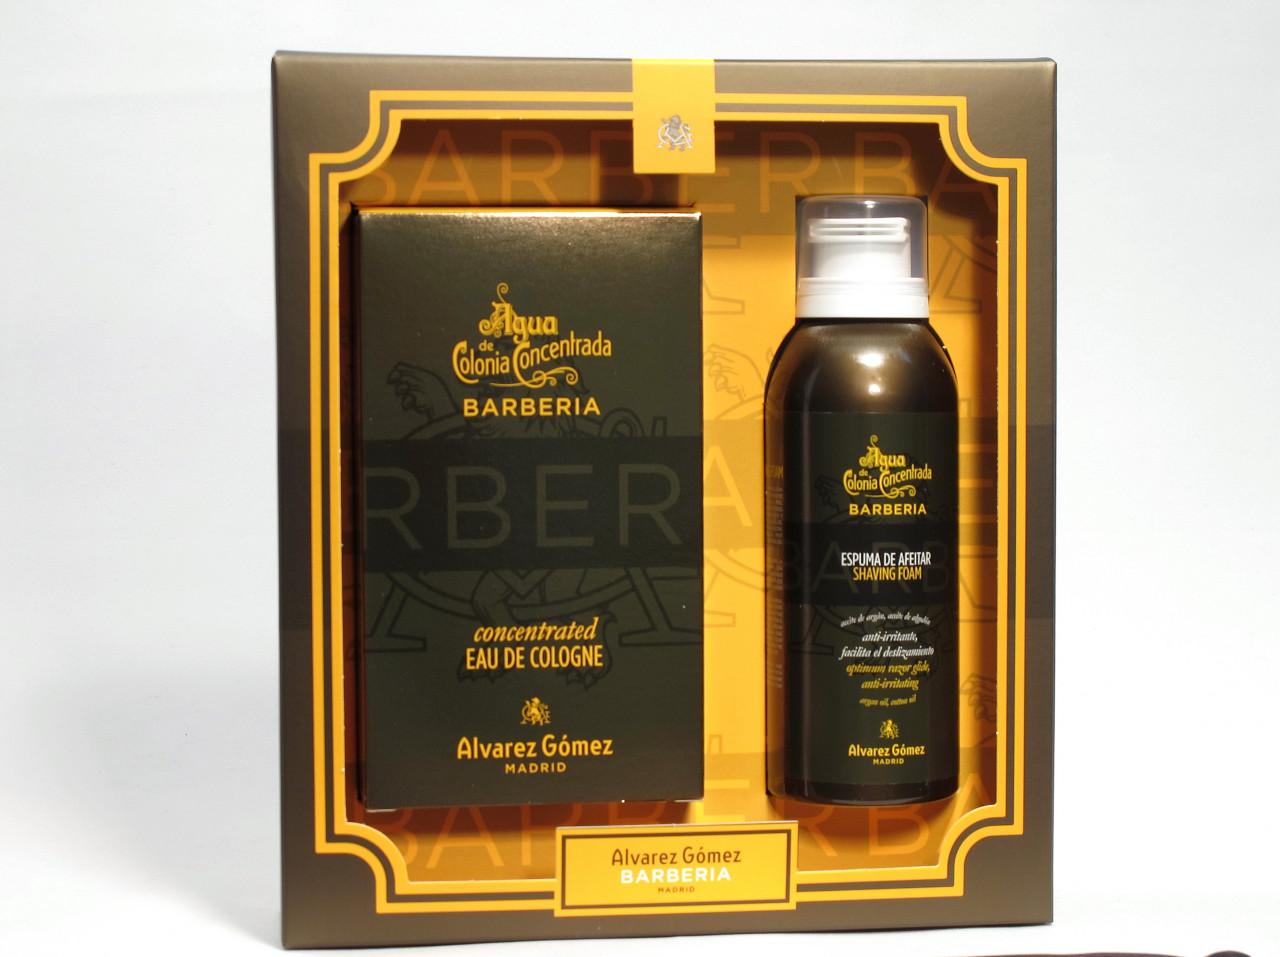 Alvarez Gomez Haar- & Bartpflege Barberia Geschenkset Concentrated Eau de Cologne Spray 150 ml + Shaving Foam 150 ml 1 Stk.